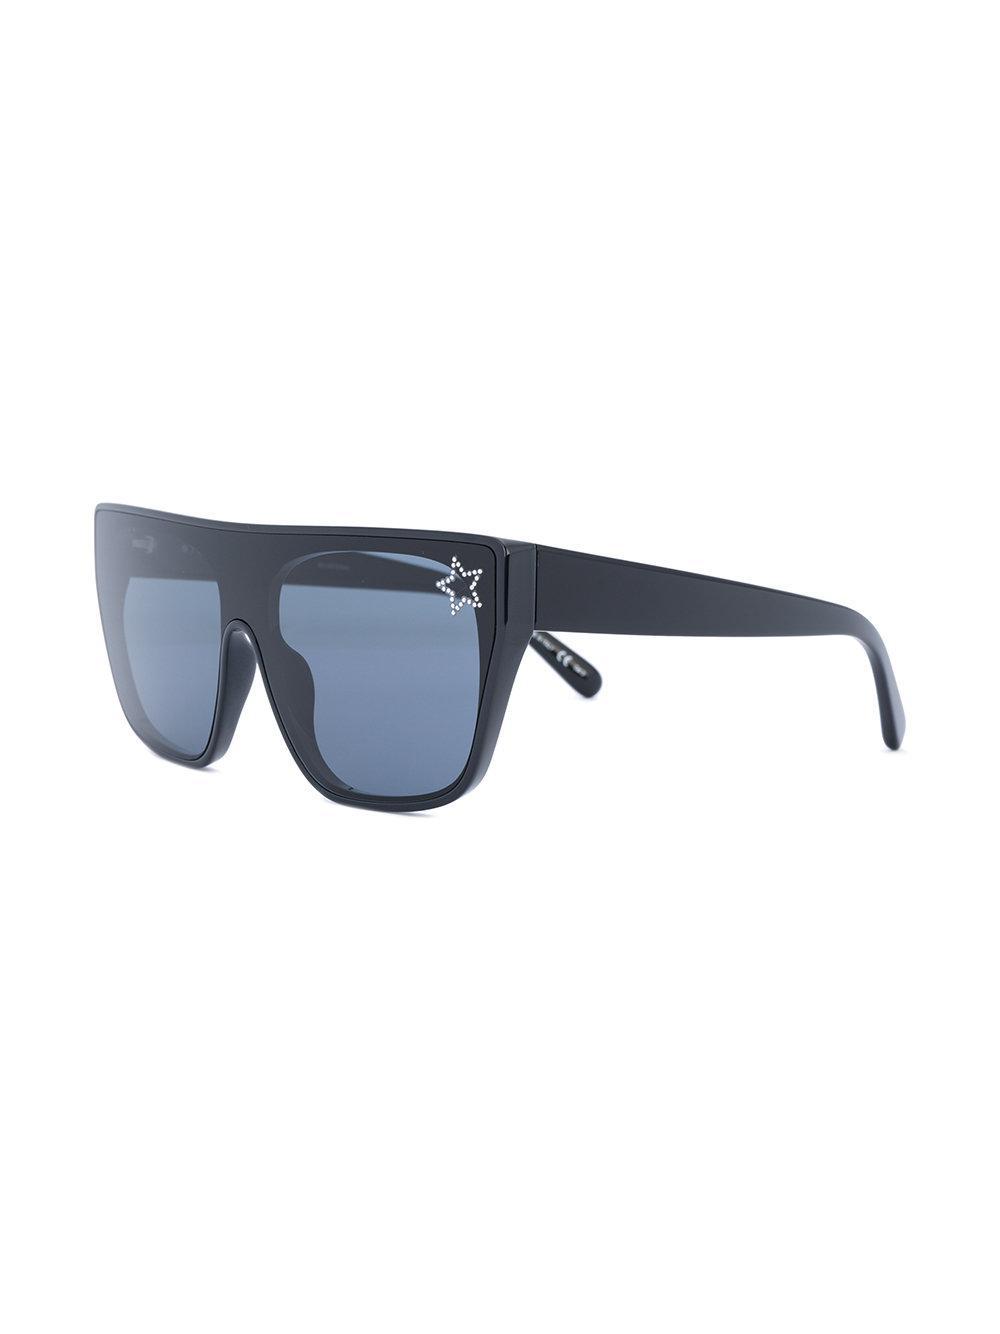 Stella McCartney Oversized Sunglasses in Black